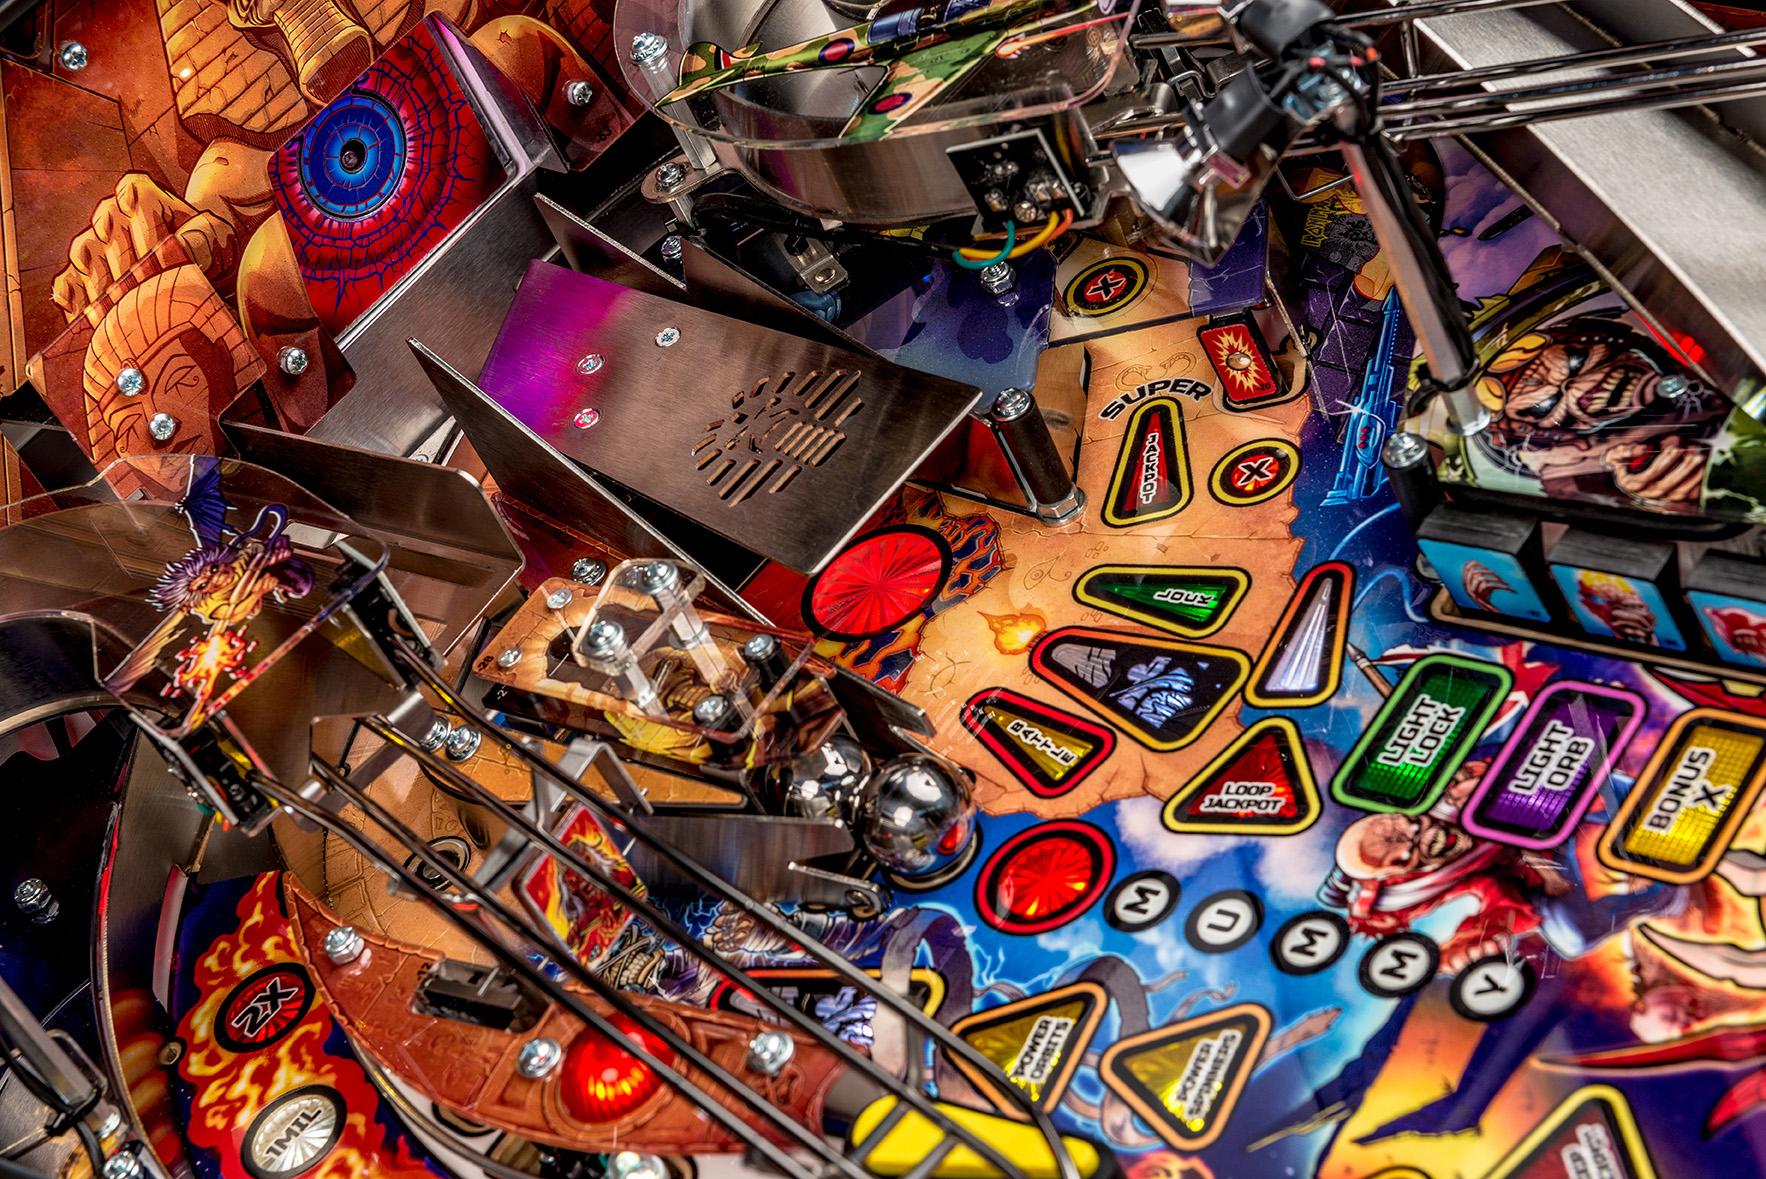 Iron-Maiden-Pinball-Machine-08a